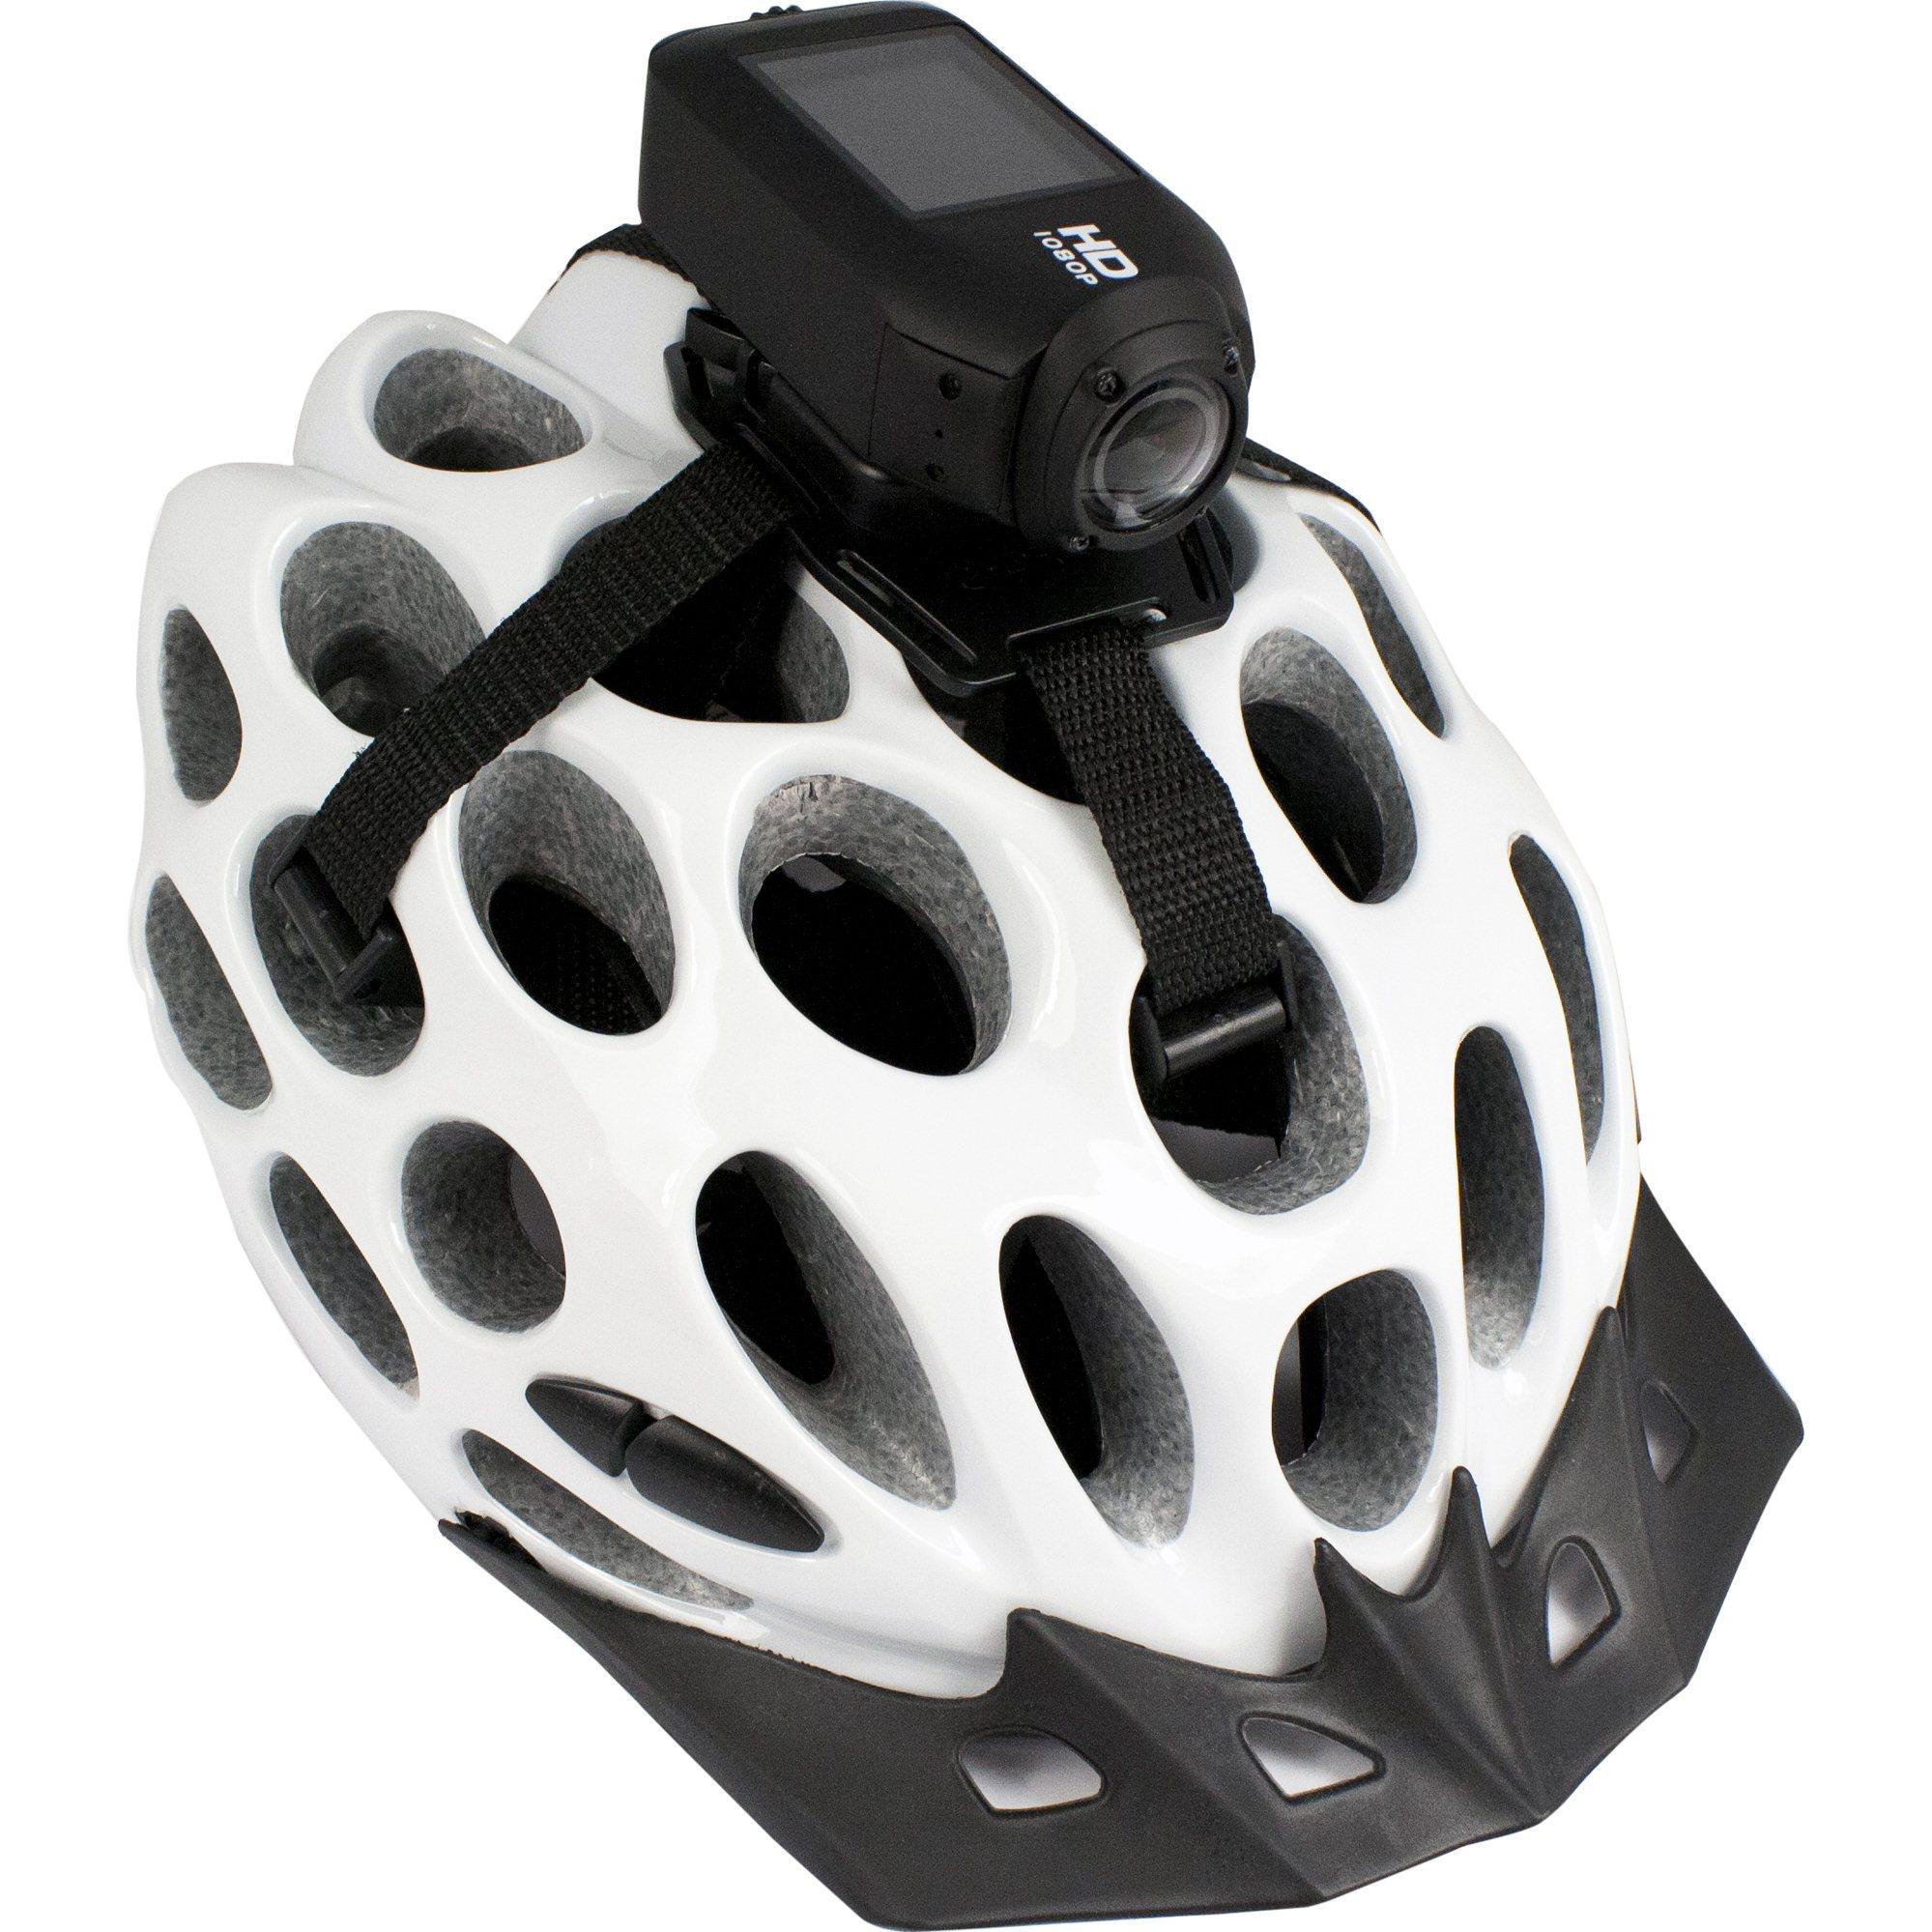 Fotografie Sistem prindere Drift pe casca ventilata pentru Camere Video Sport